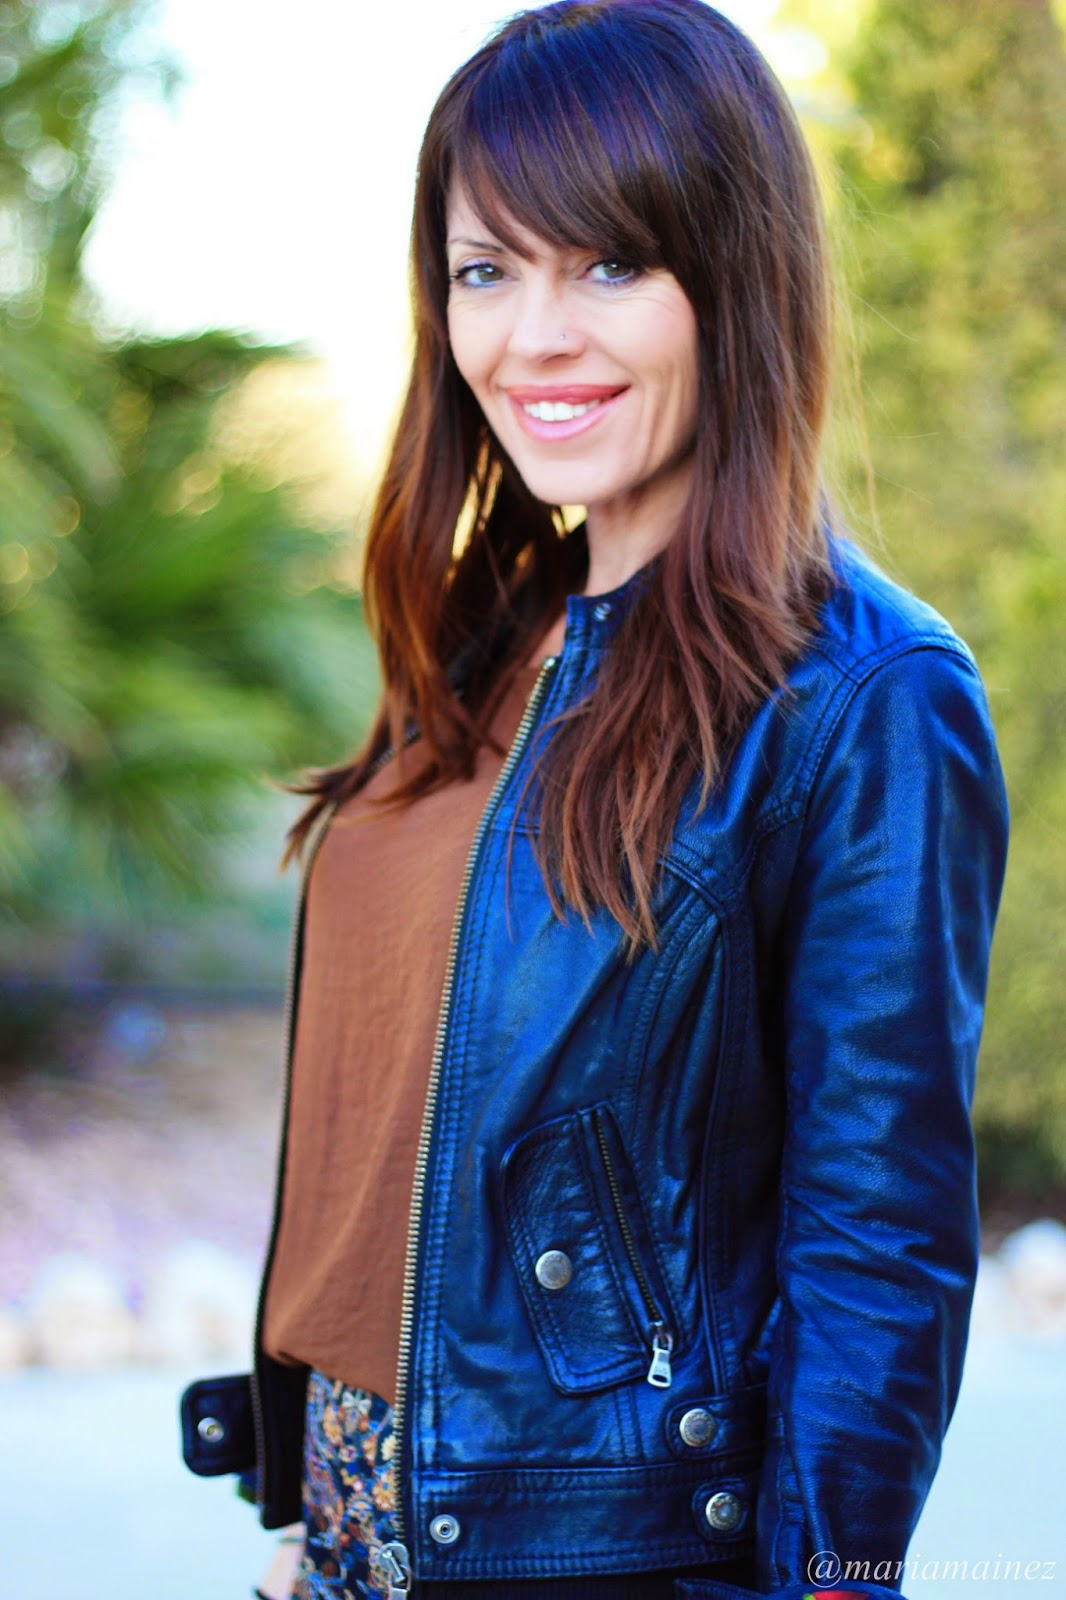 Biker- Streetstyle 2015 - Bbeautifulbymaria - Fashion Blogger - Outfit 2015